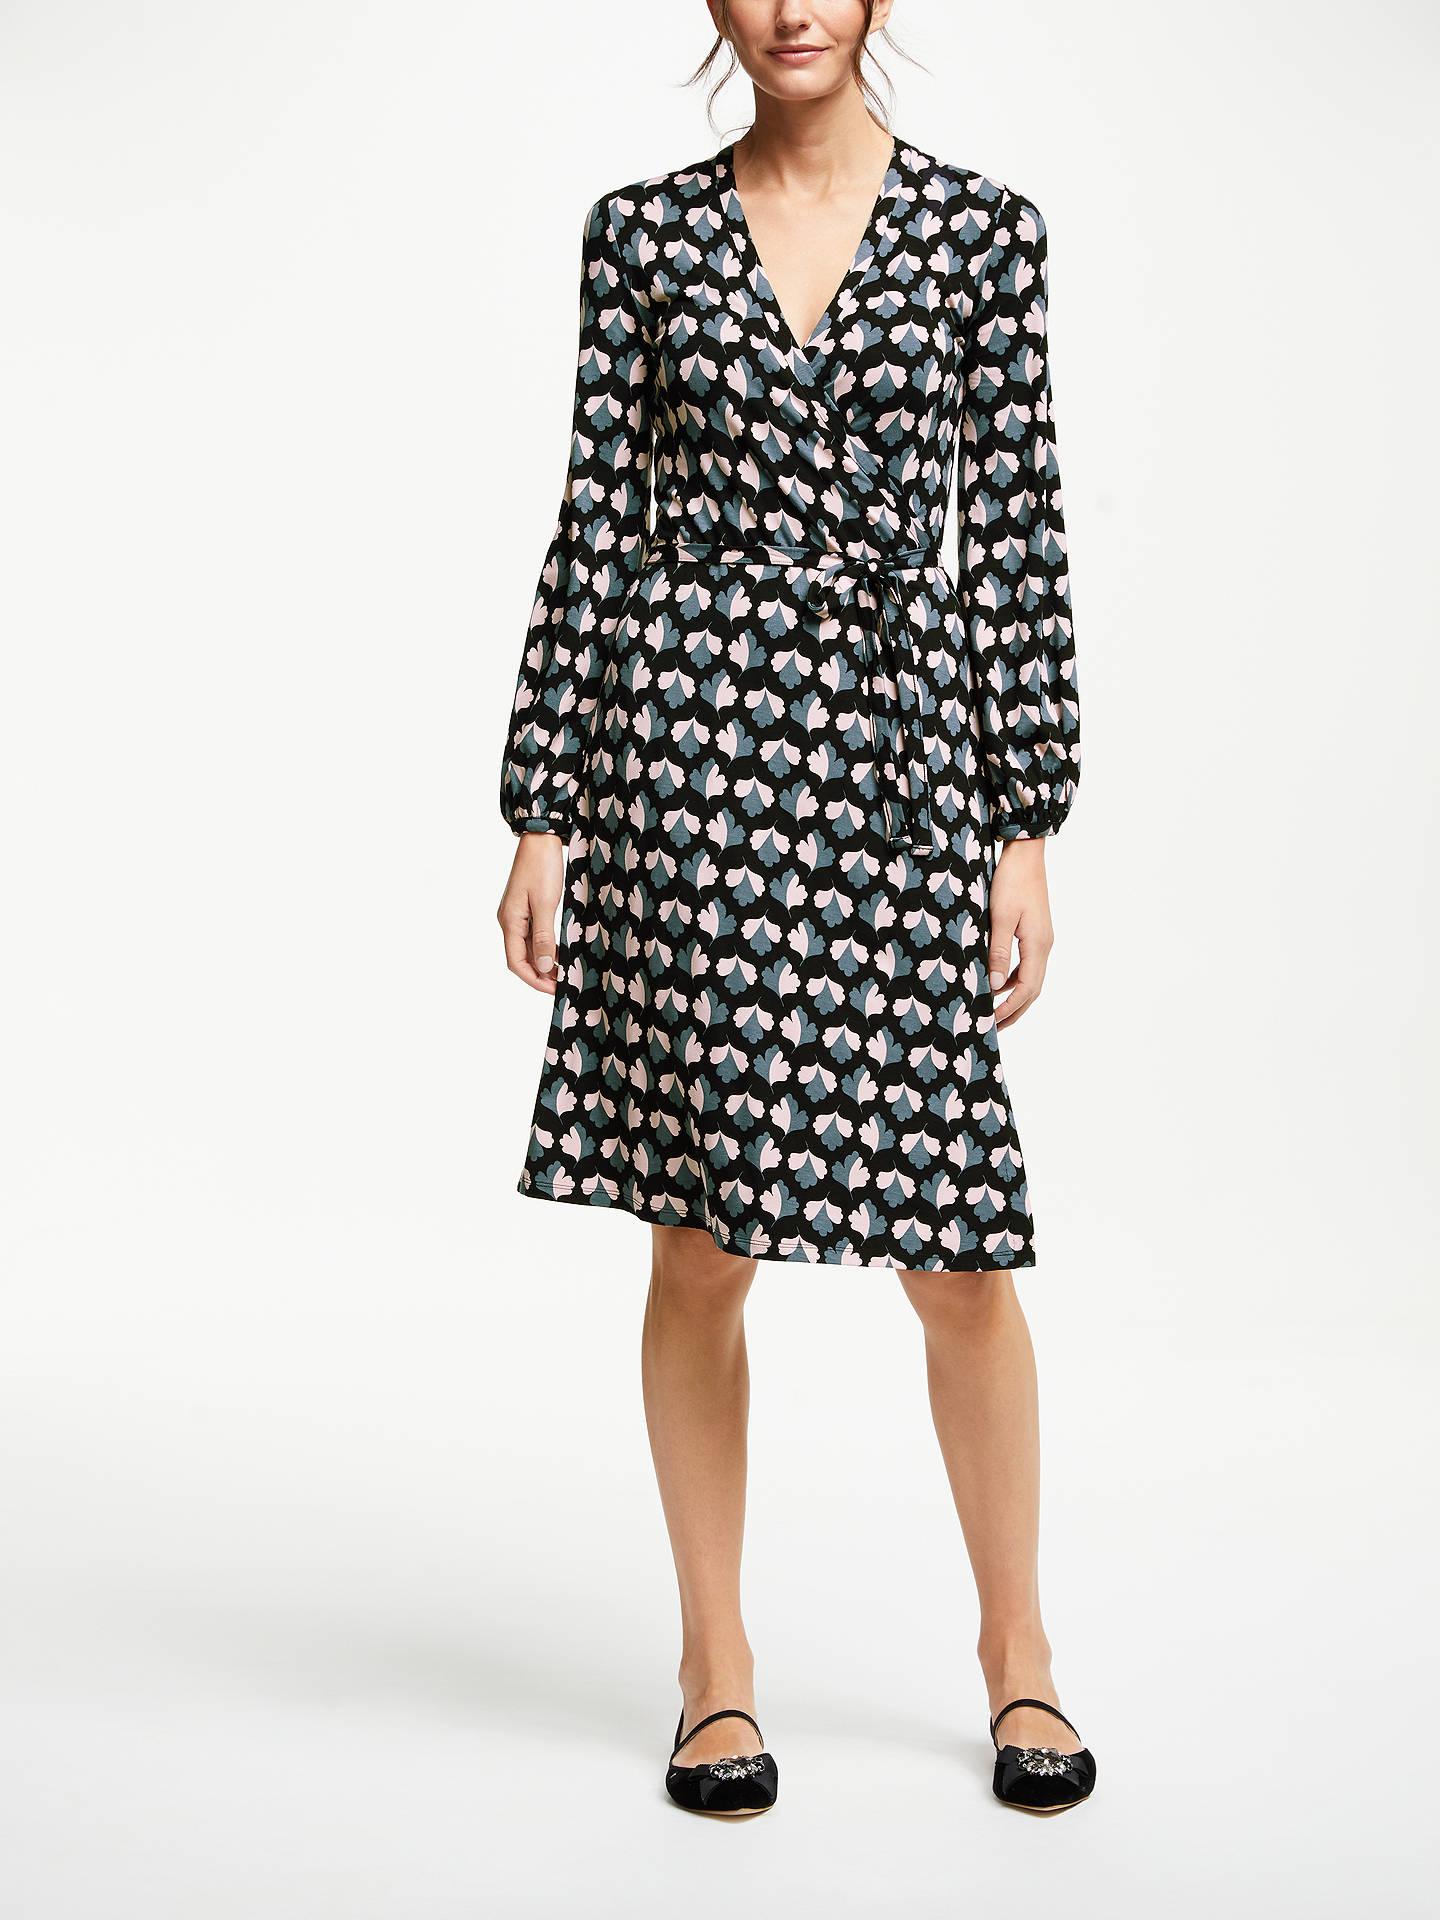 Boden Elodie Jersey Wrap Dress At John Lewis Amp Partners